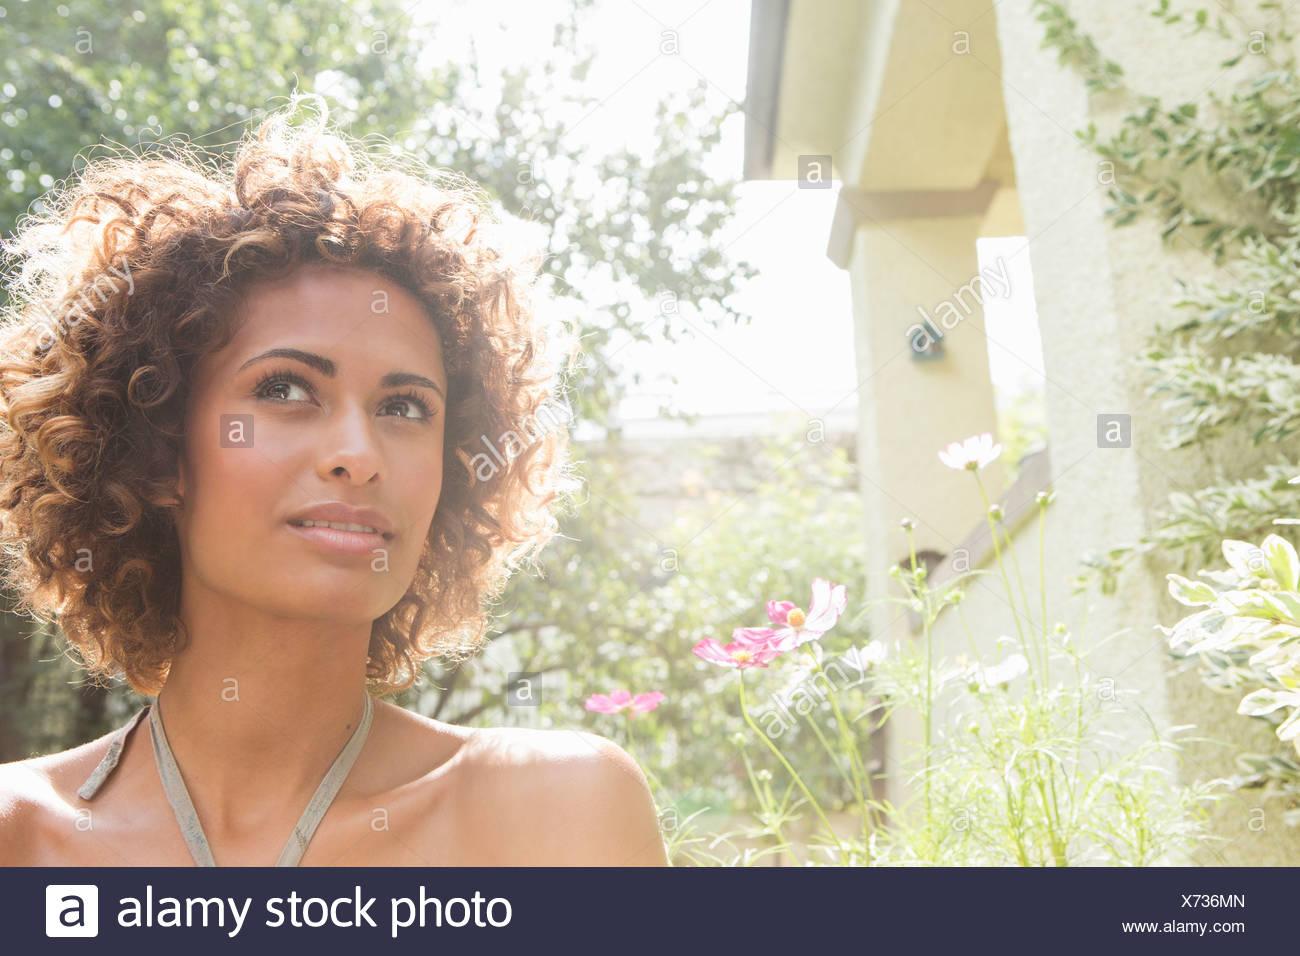 Woman walking in garden - Stock Image